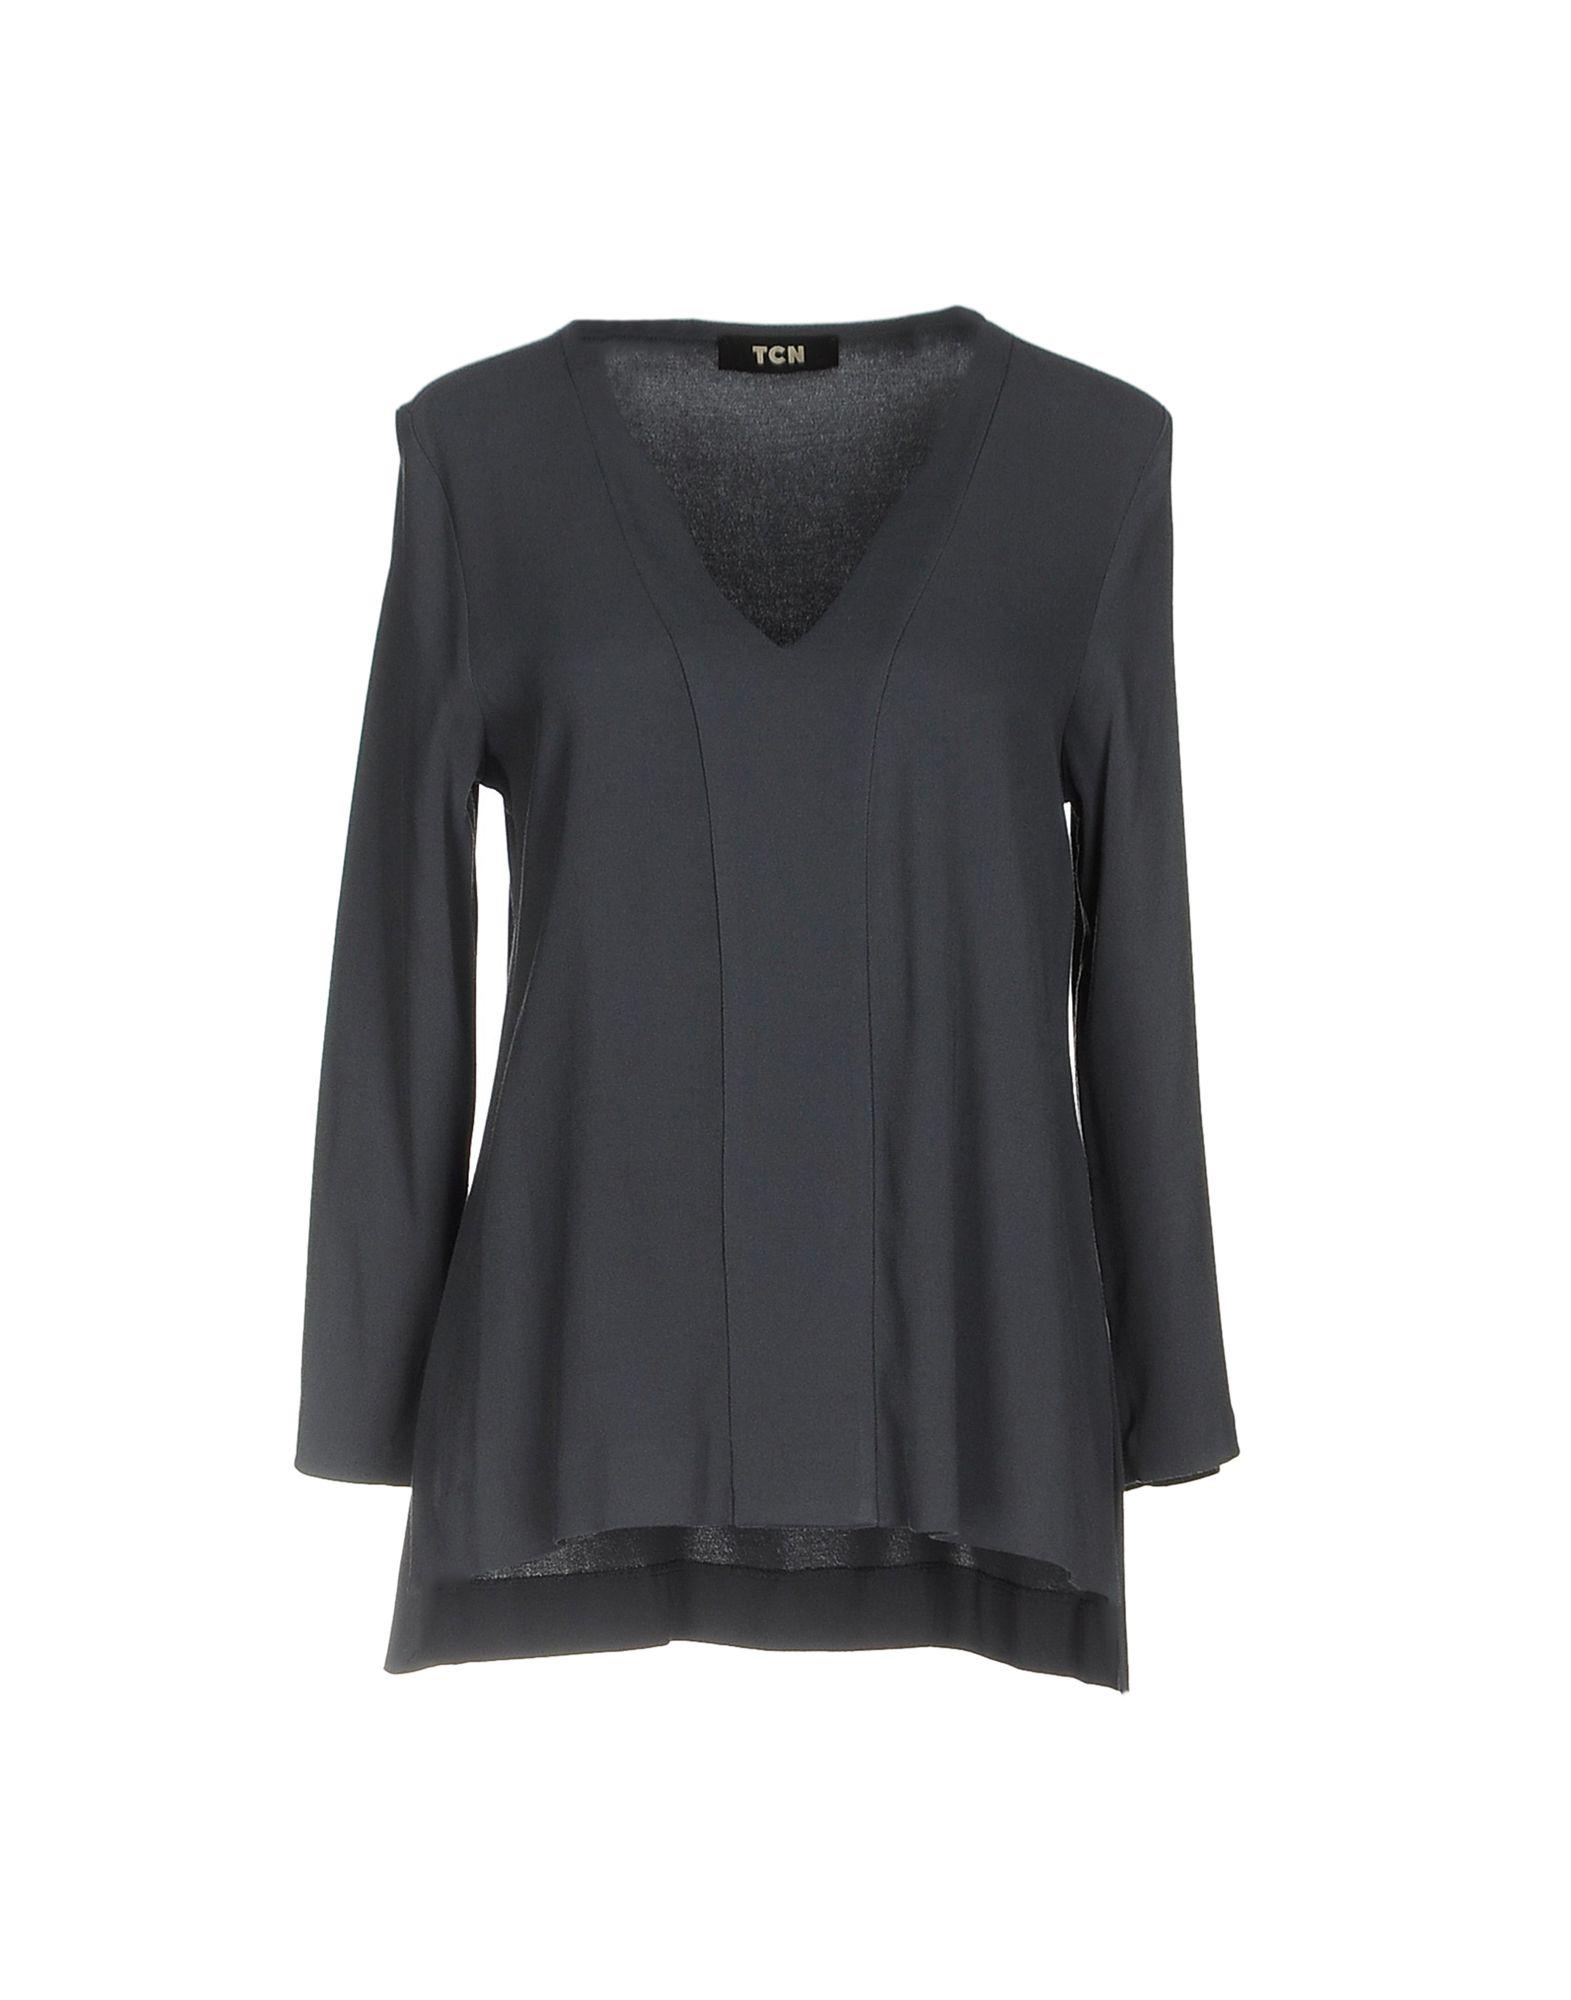 TOTON COMELLA - TCN Damen Bluse Farbe Taubenblau Größe 6